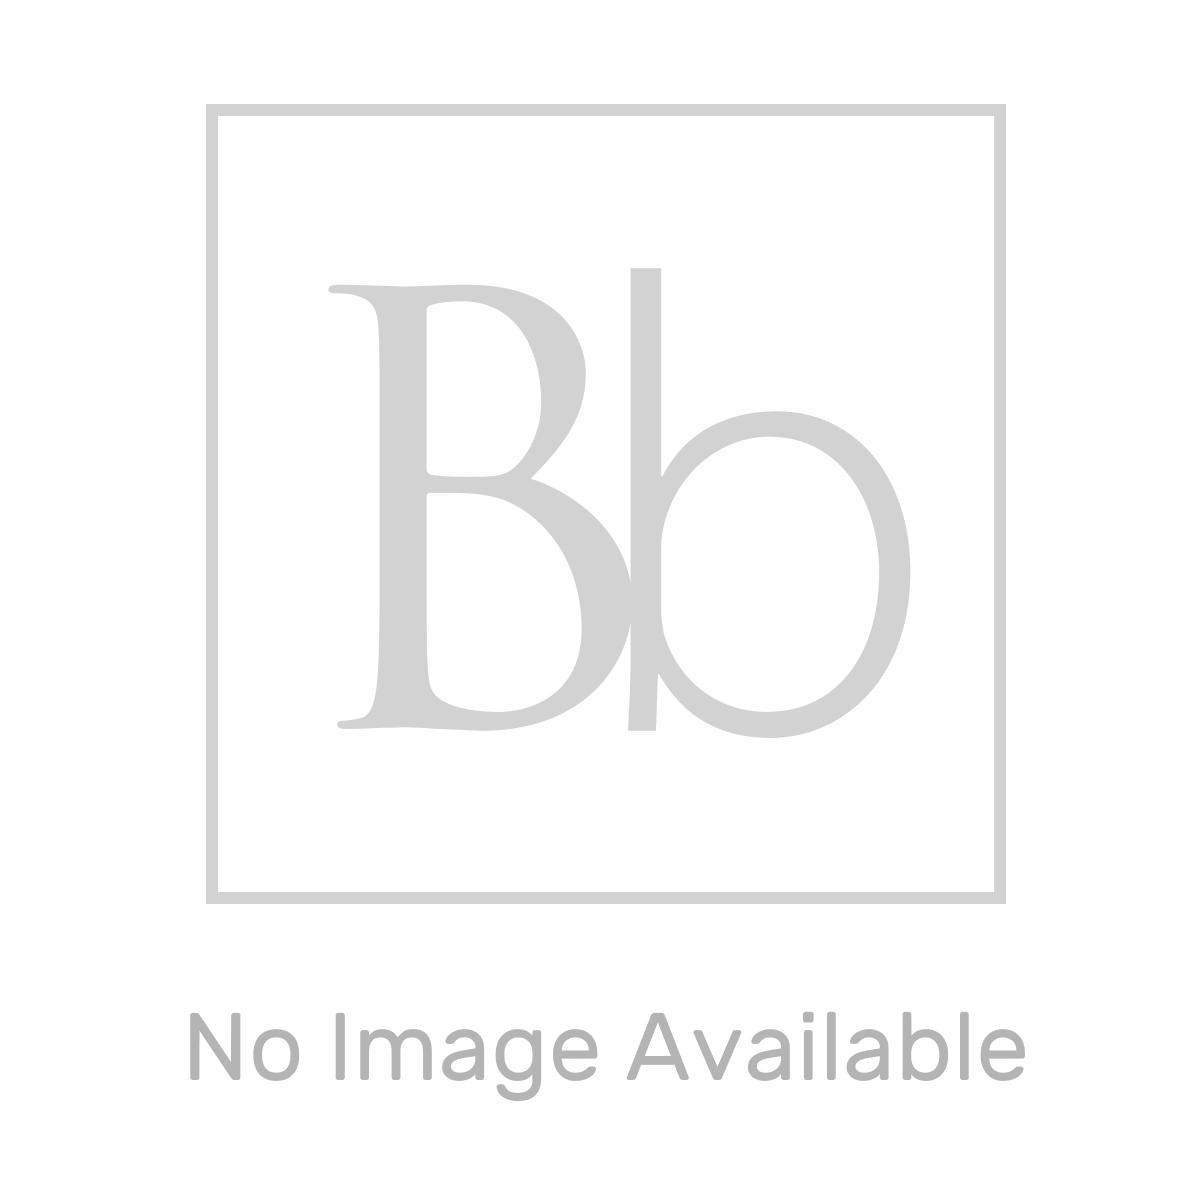 Mito White Gloss Wall Hung Vanity Unit 500mm Line Drawing 2